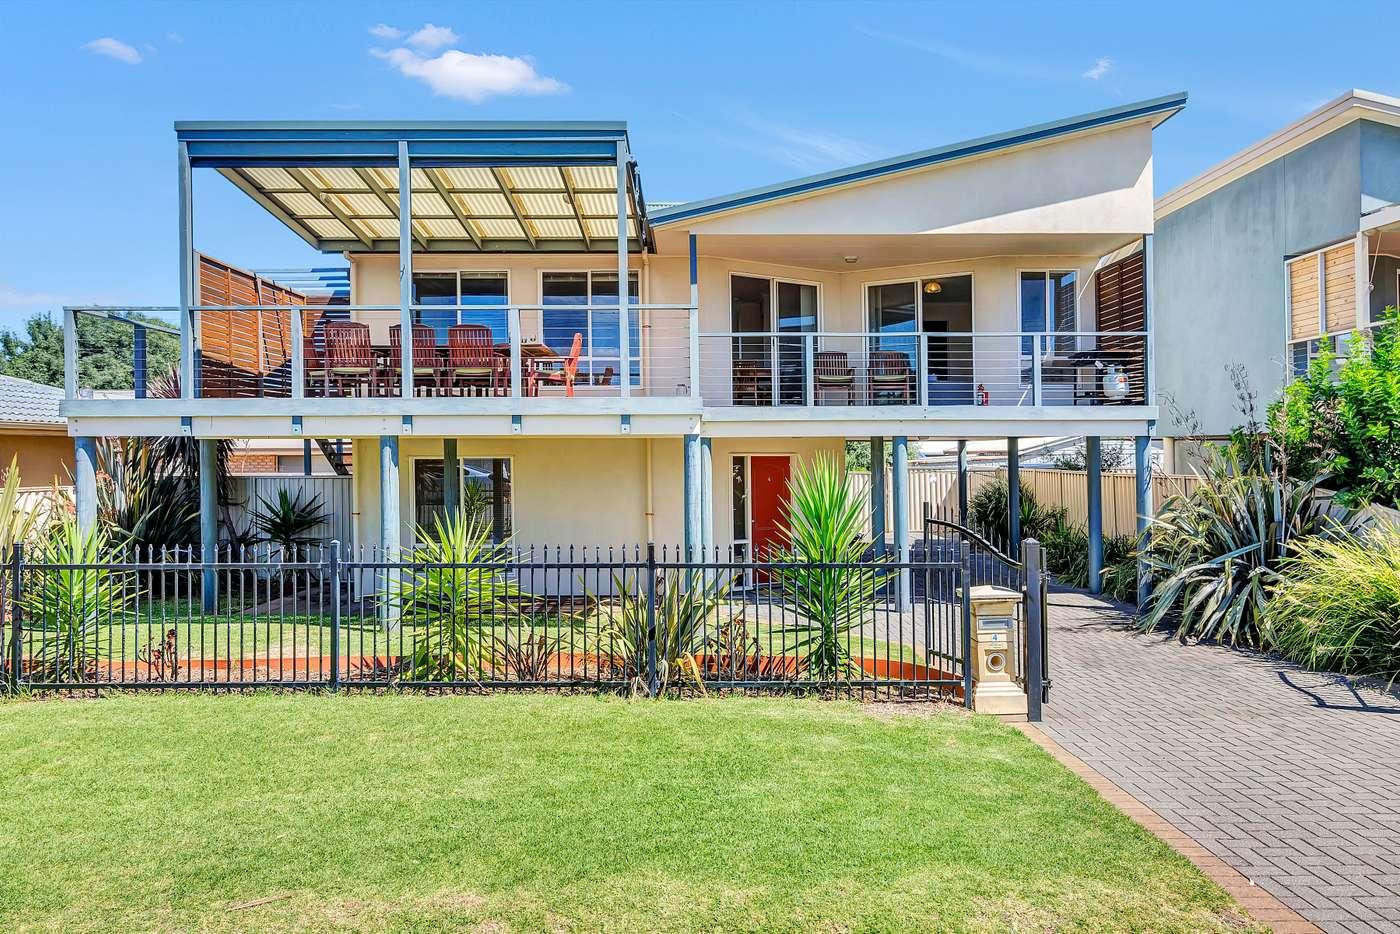 Main view of Homely house listing, 4 Thomas Street, Aldinga Beach SA 5173